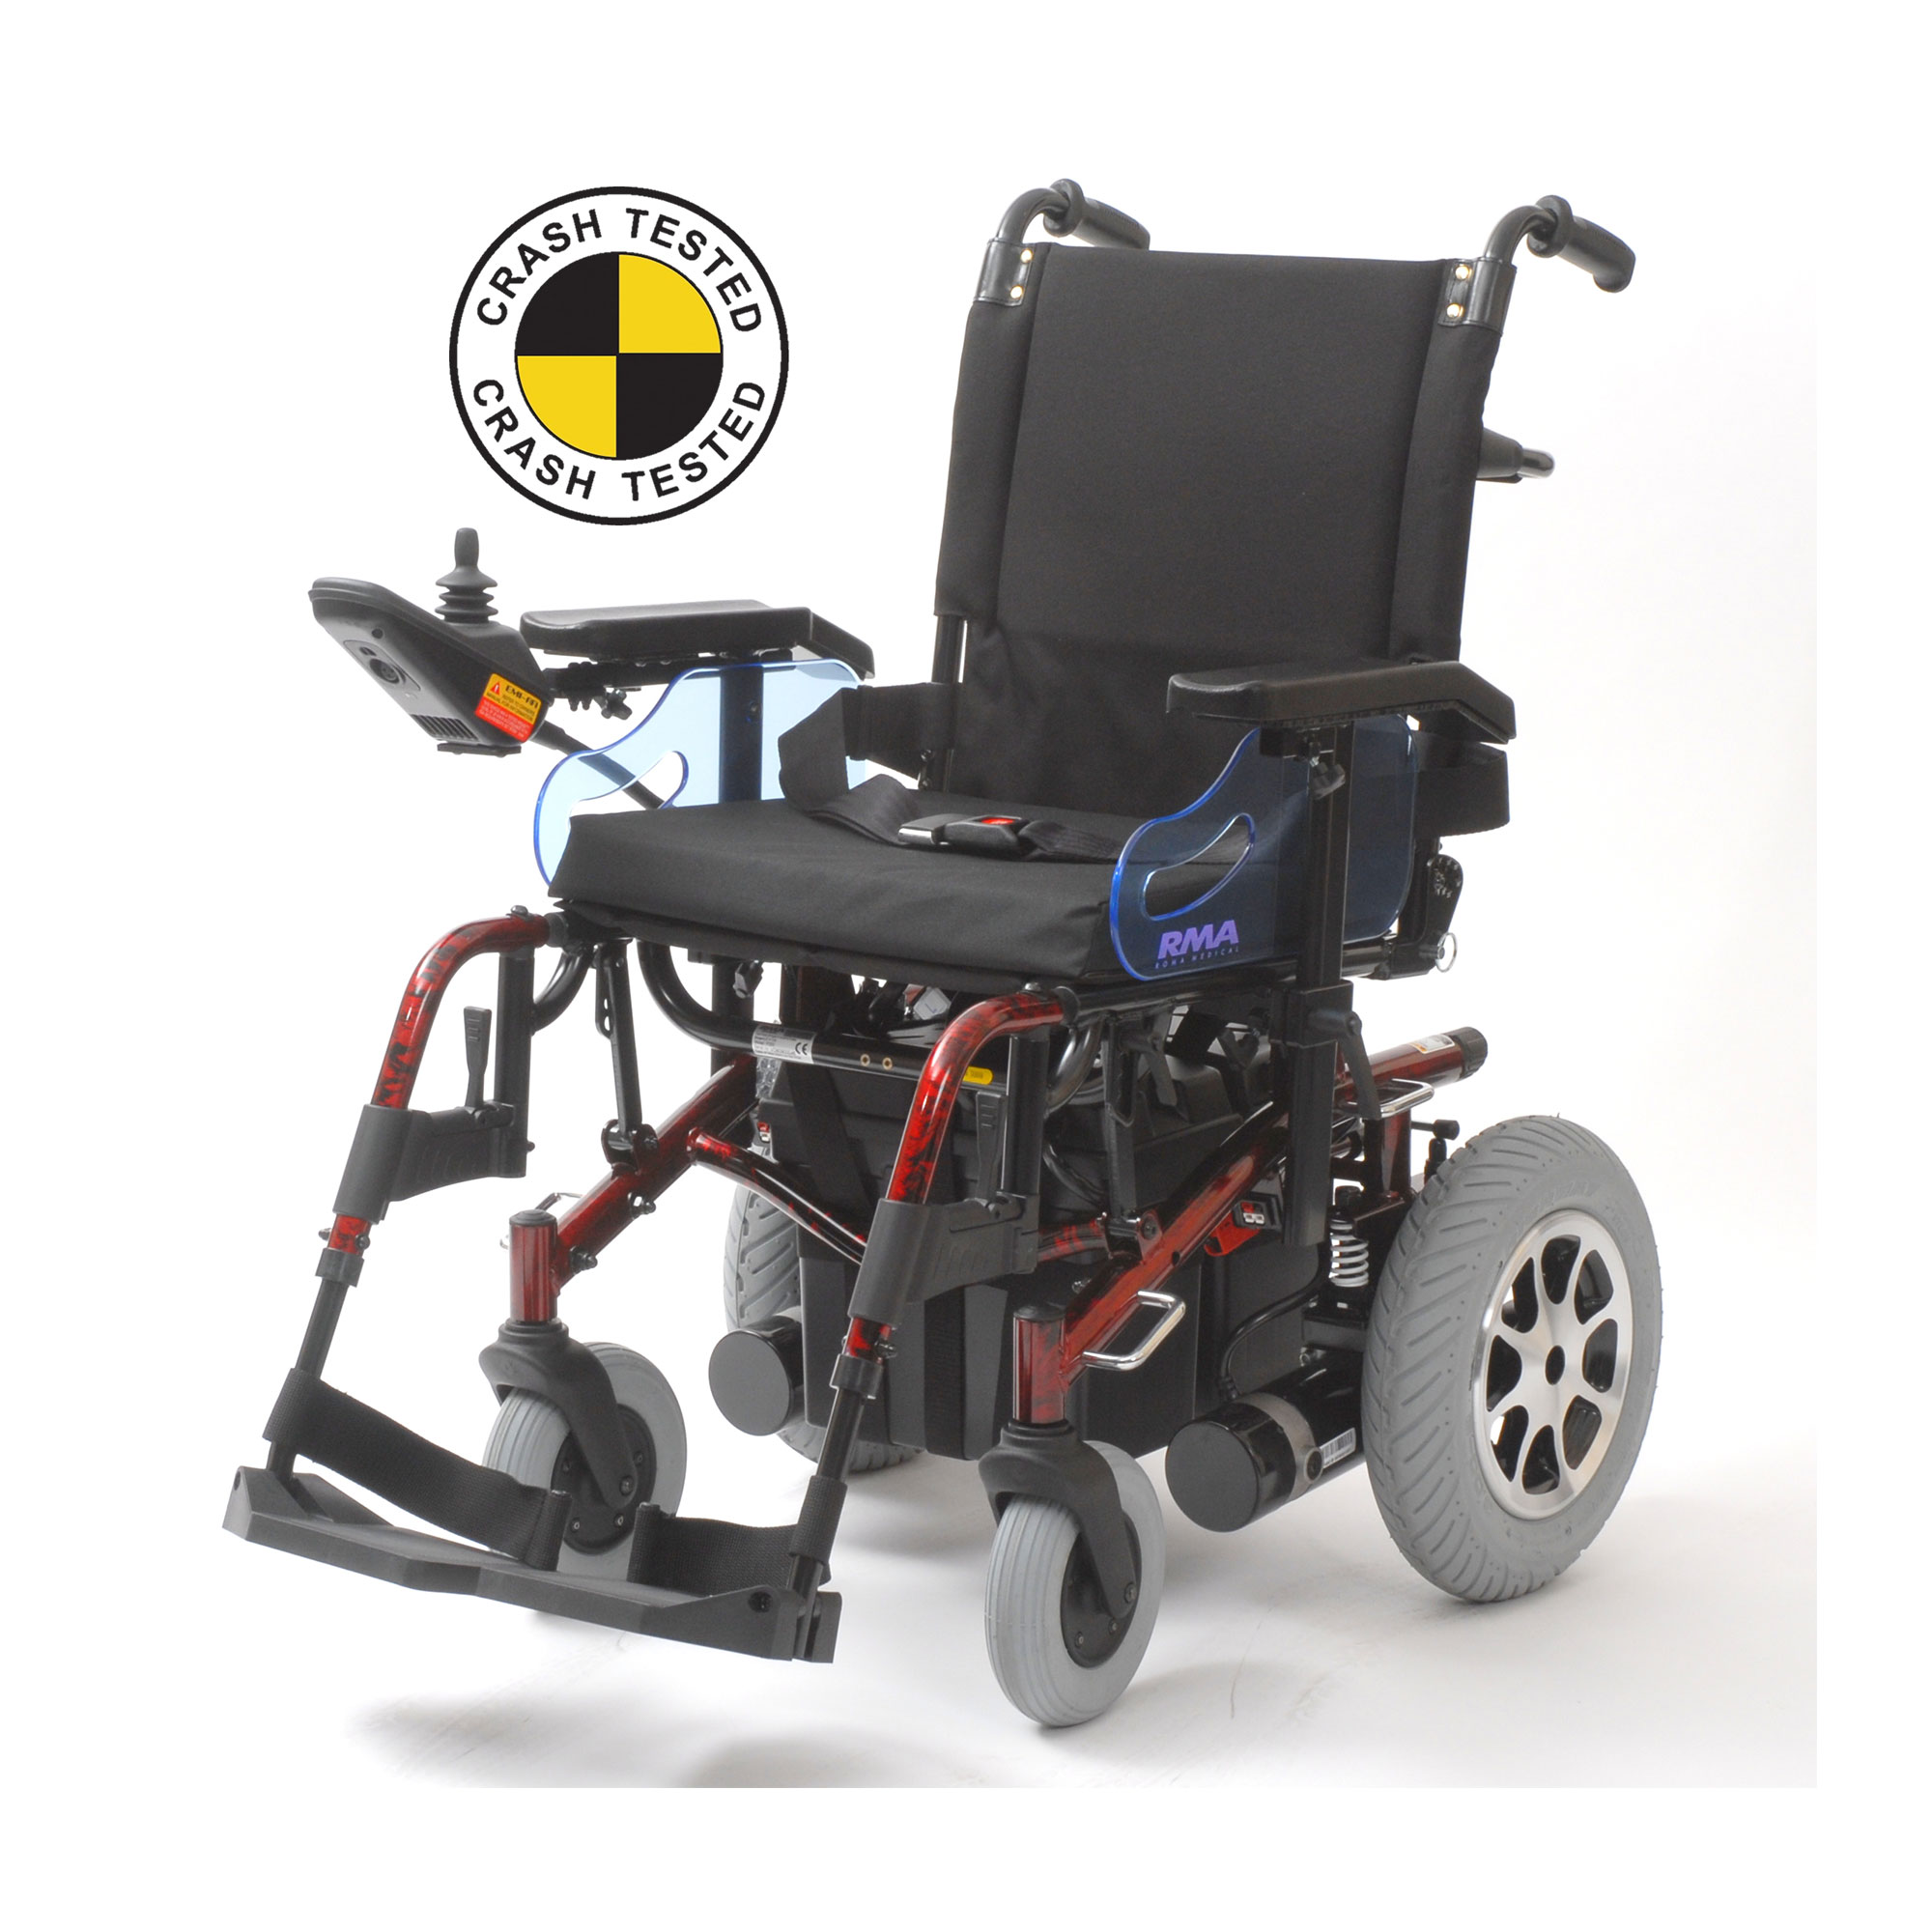 wheelchair nhs transport chair walgreens roma marbella power medical